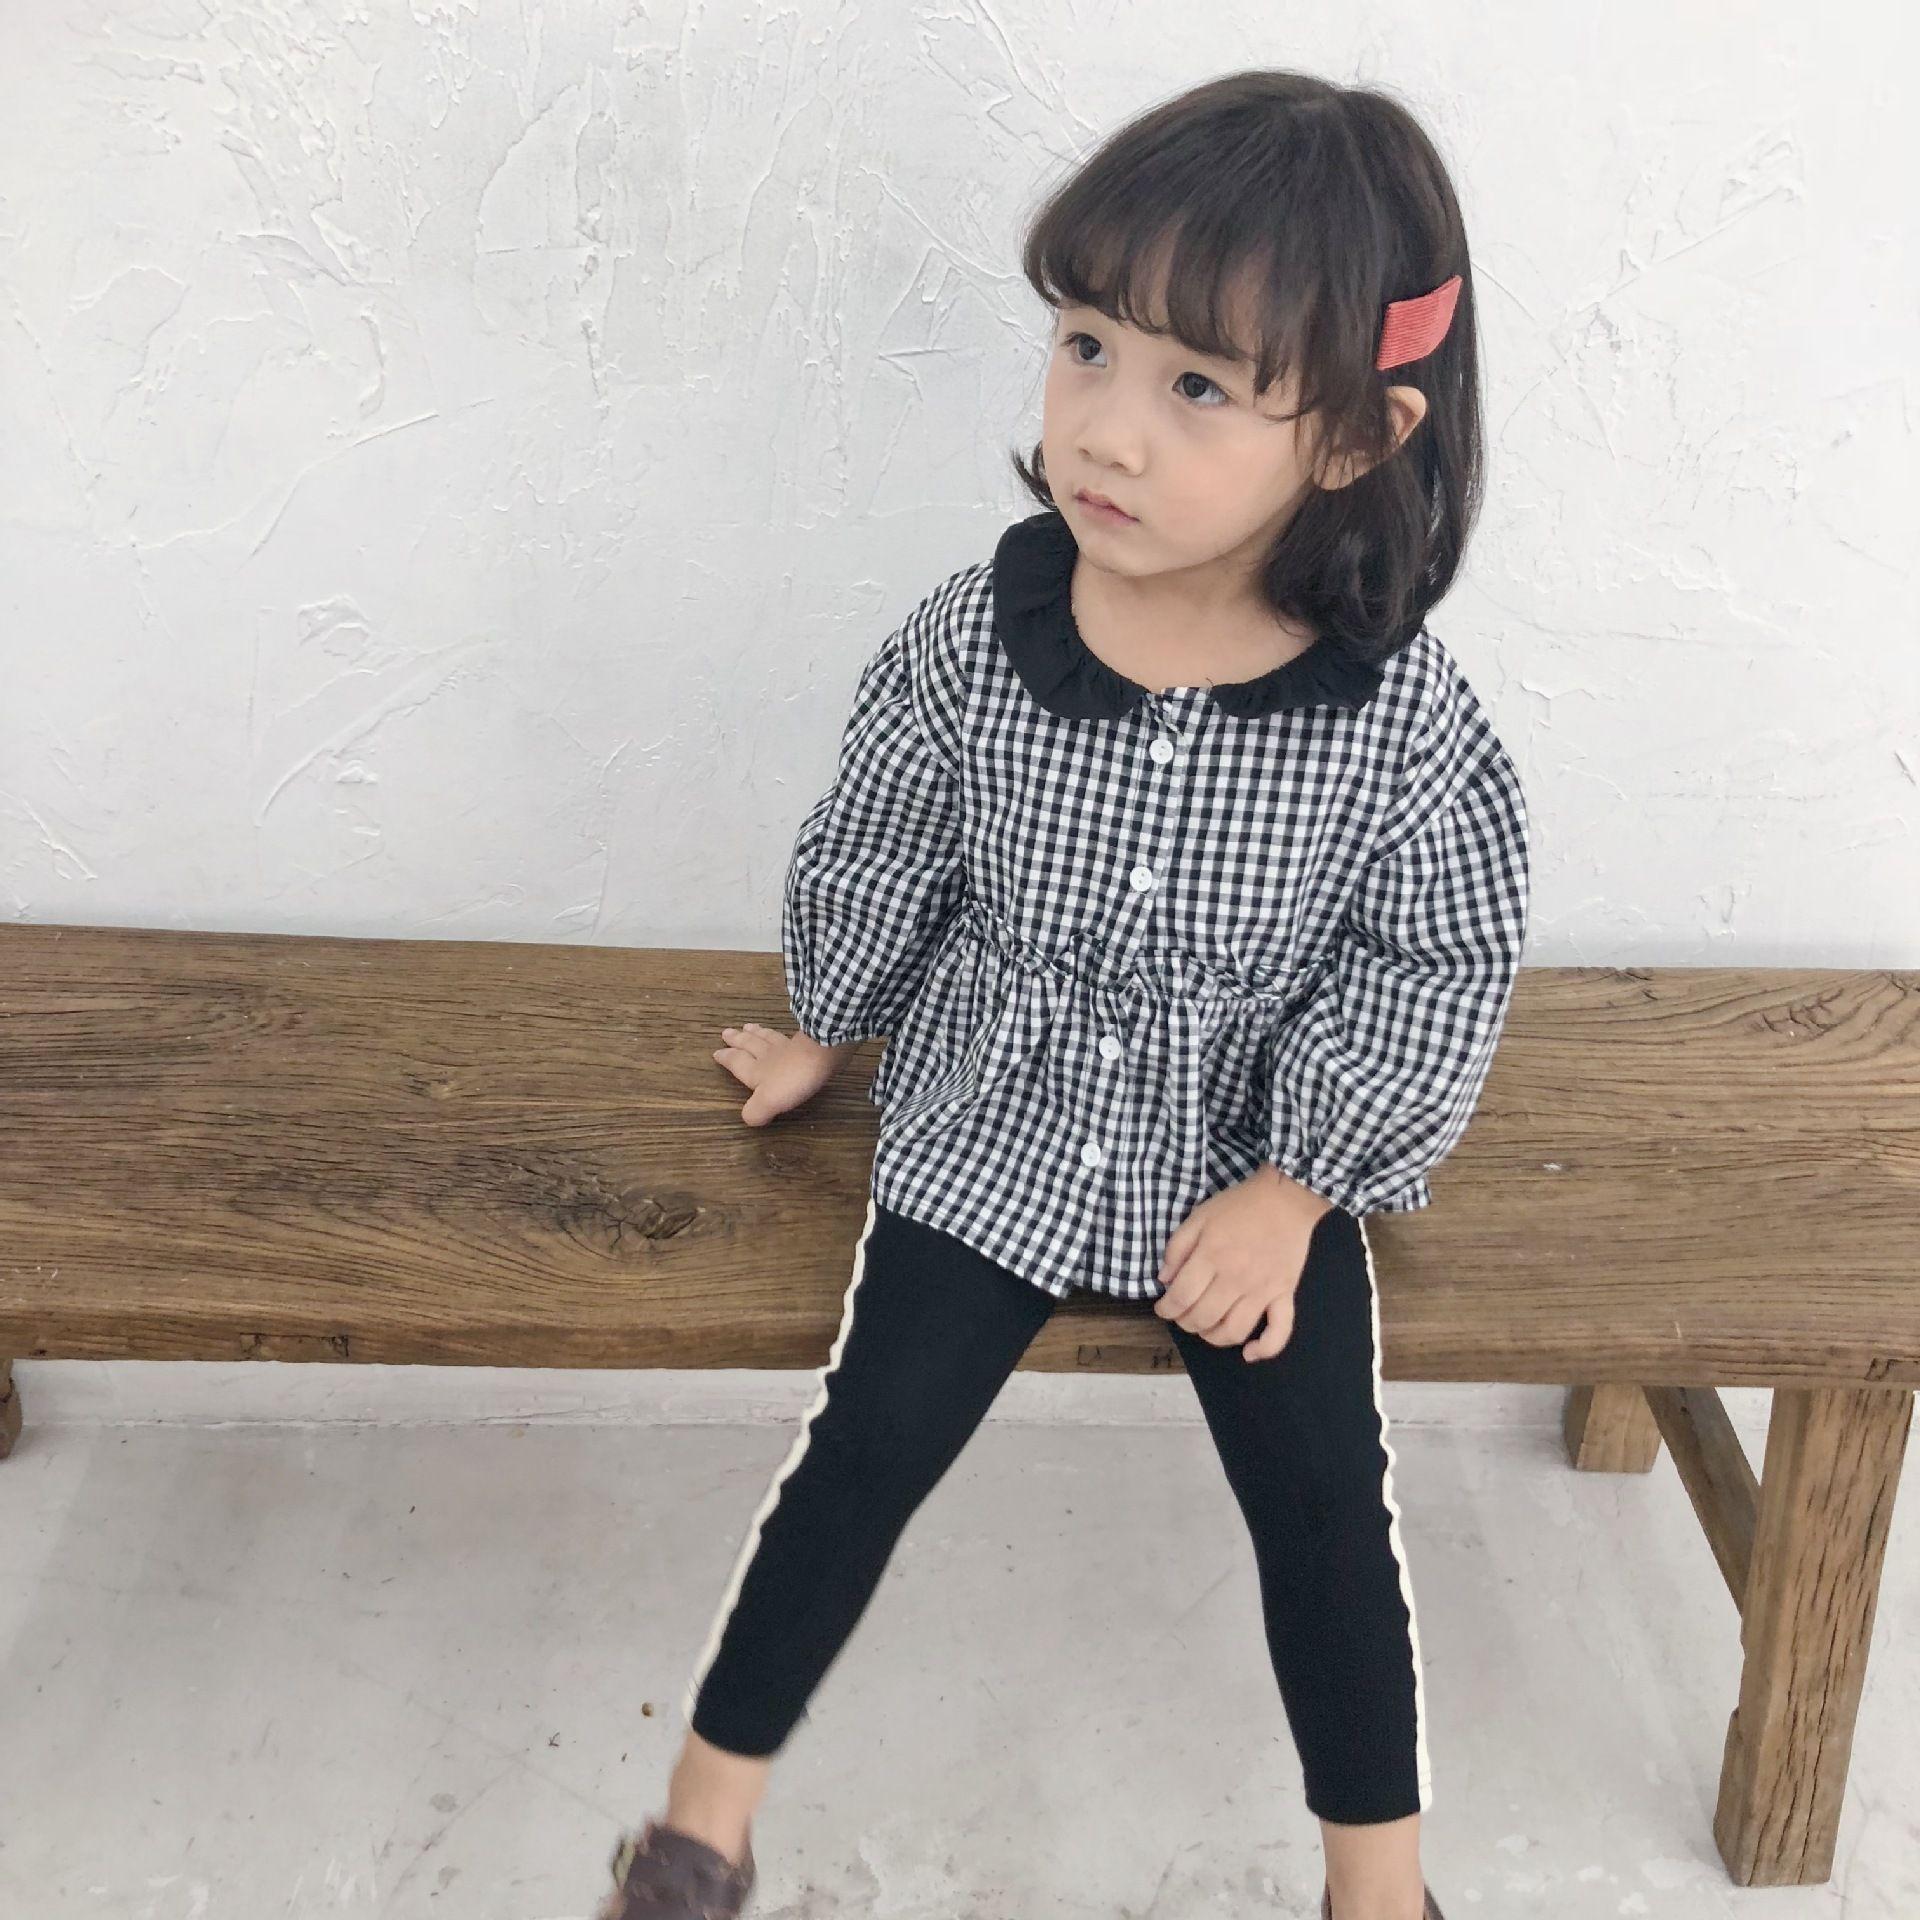 new products a01ef 6d2ba 2018 Camicia a scacchi bianca e nera New Children Camicia a maniche lunghe  da ragazza